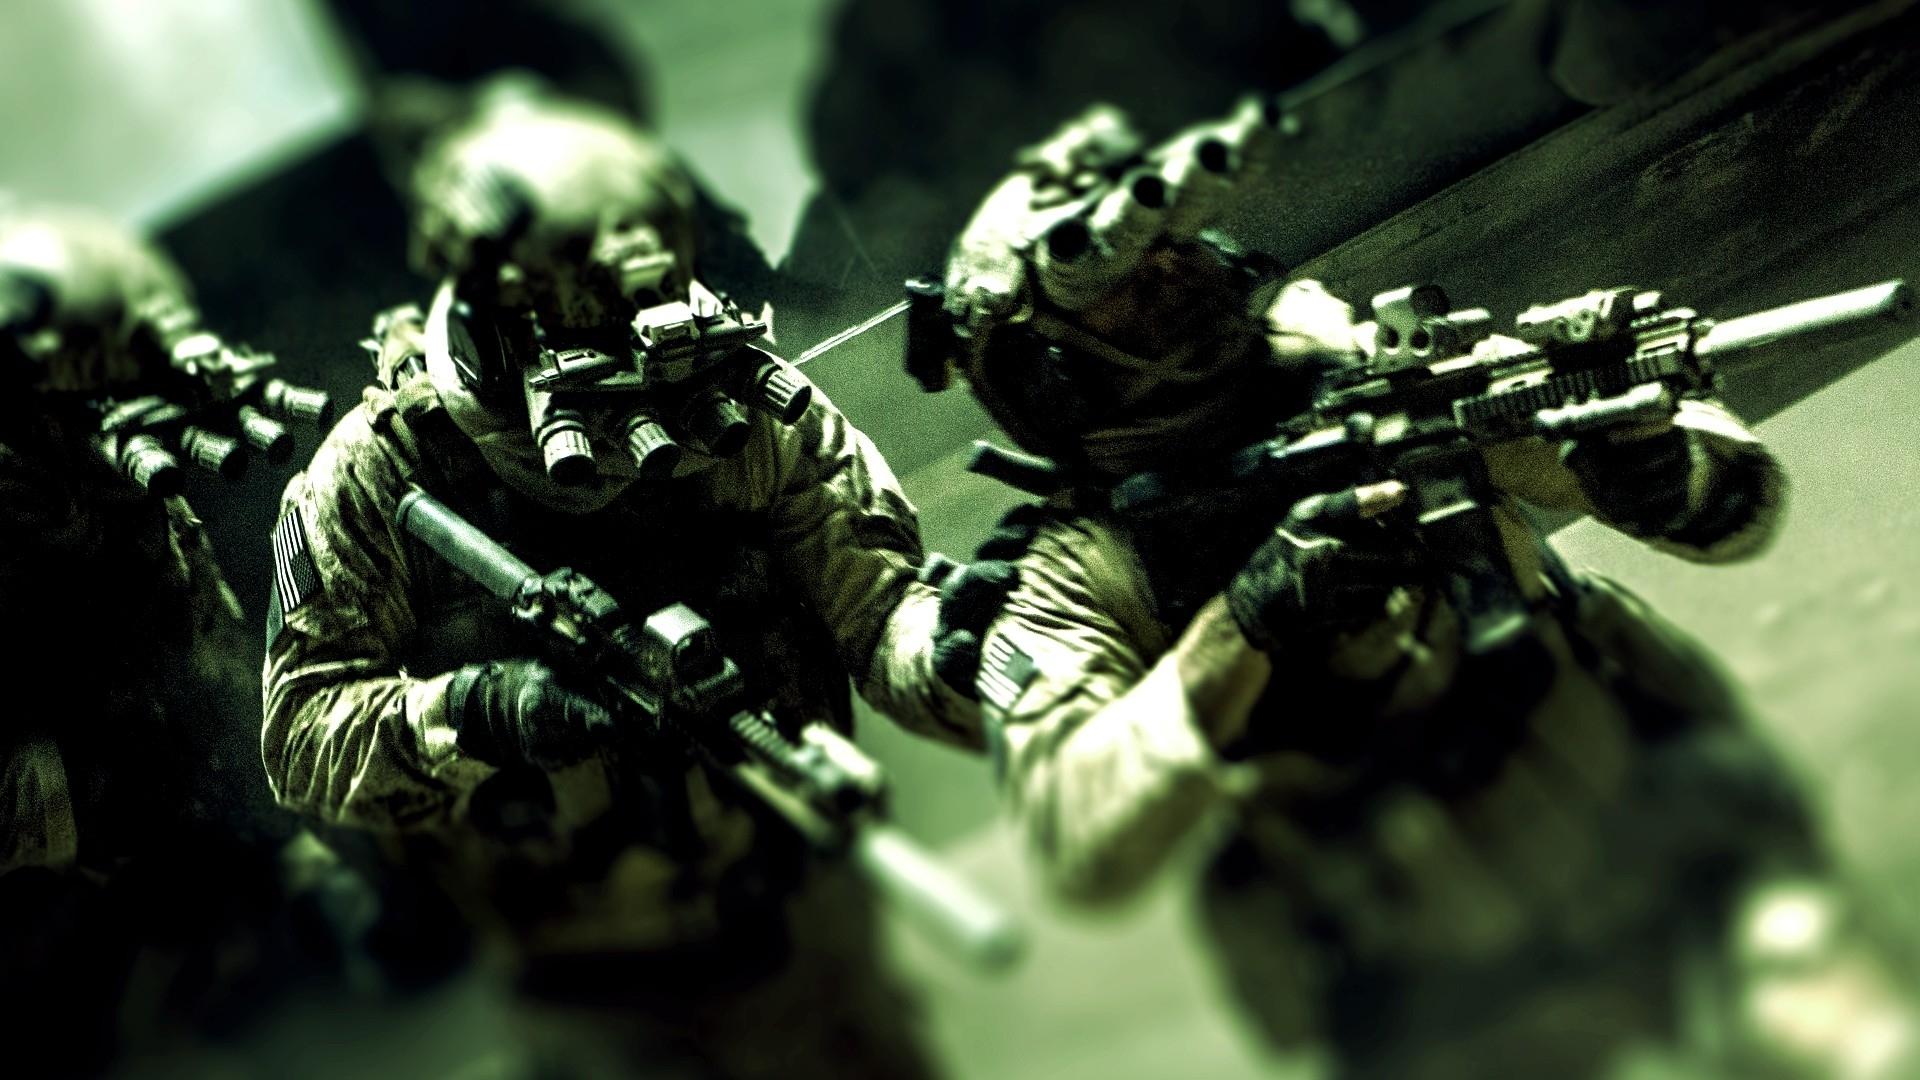 army military weapons navy seals zero dark thirty 1920x1080 wallpaper 1920x1080